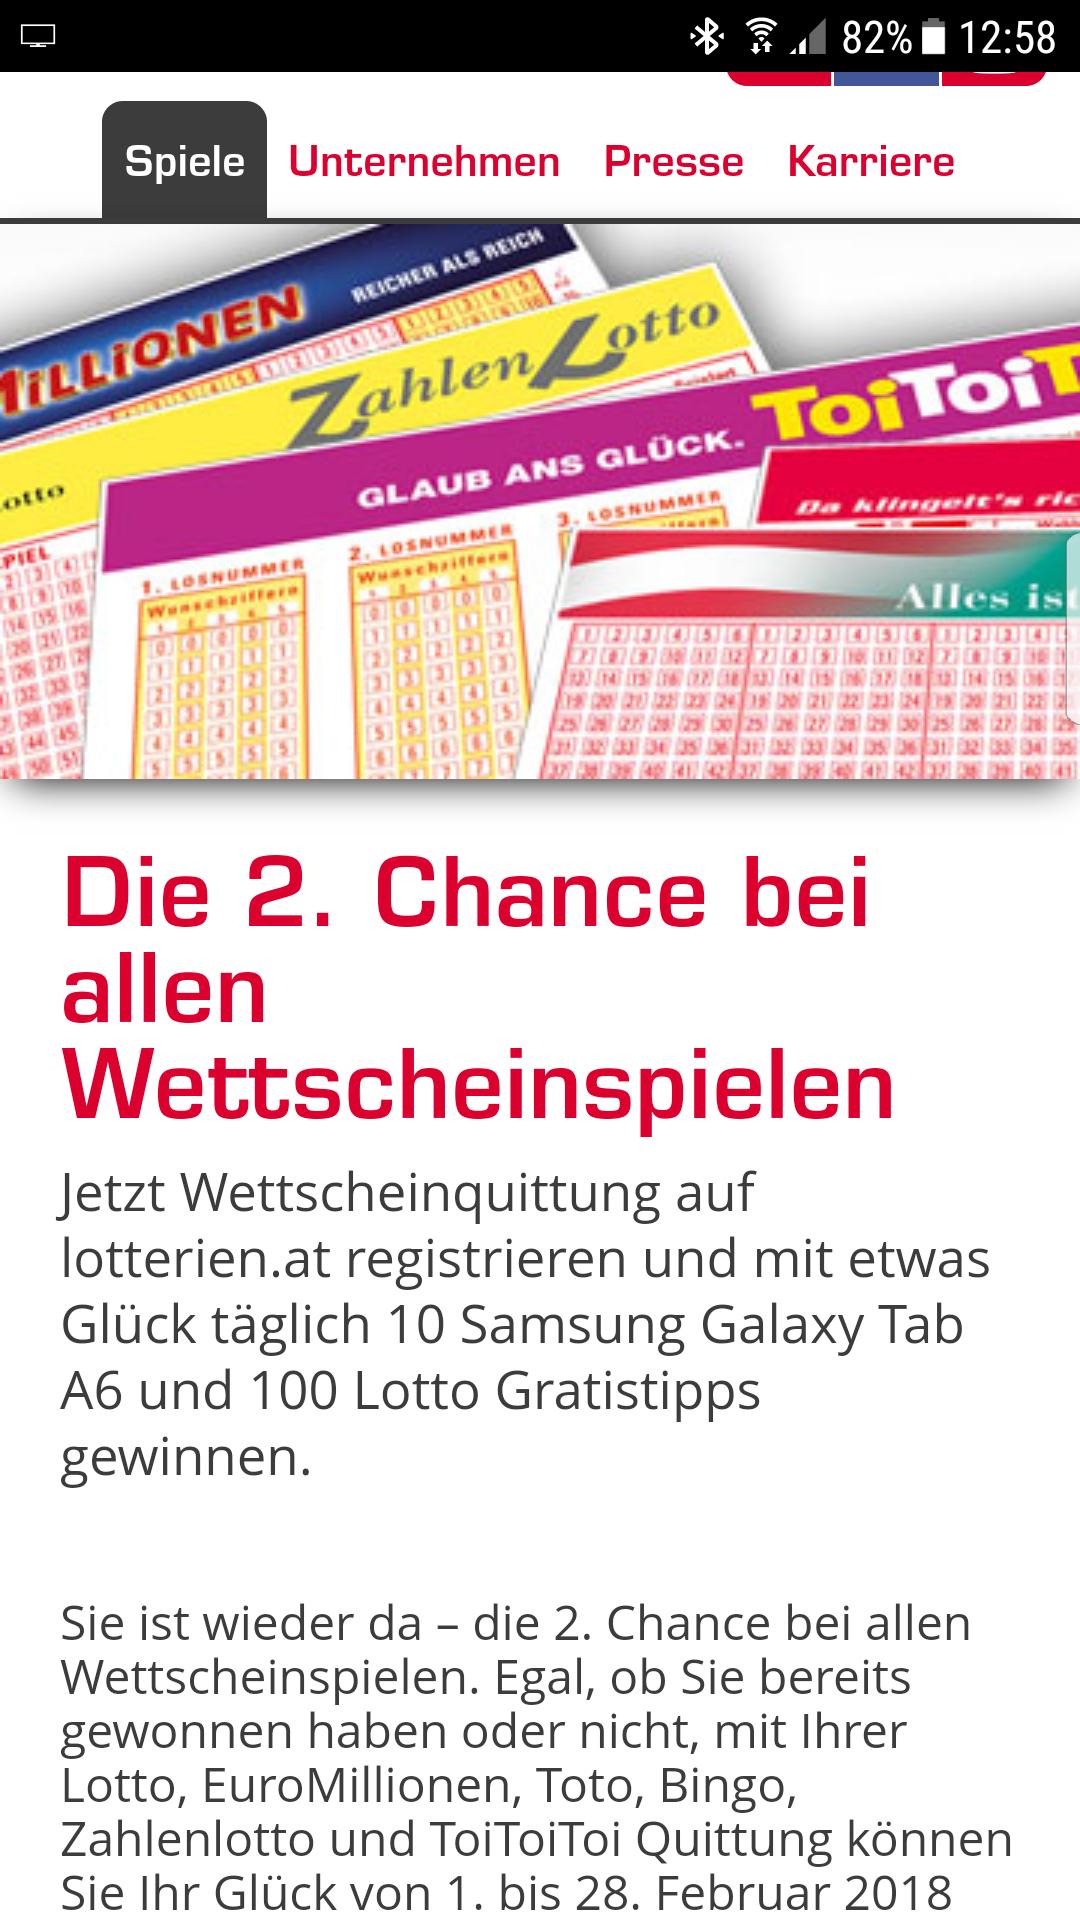 Lotterien.at - 2. Chance bei allen Wettscheinspielen